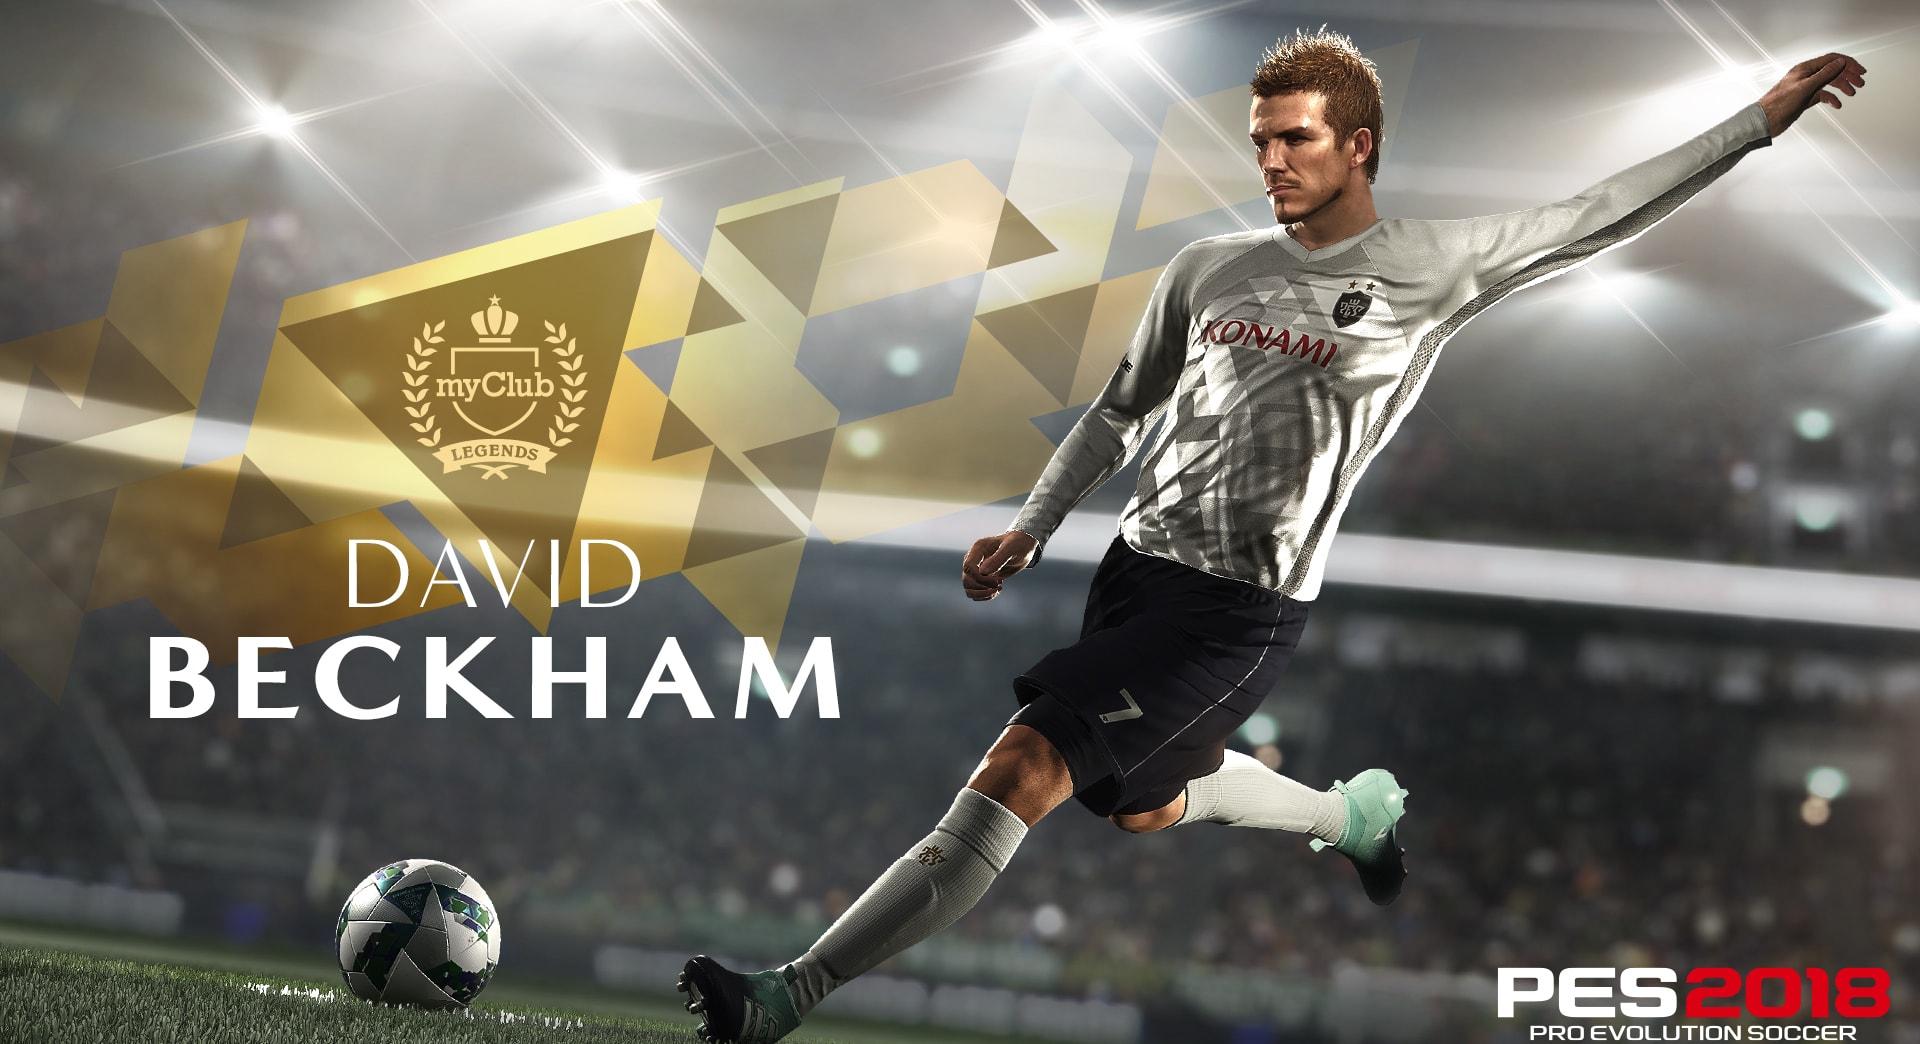 David Beckham devient ambassadeur du jeu vidéo PES — Insolite